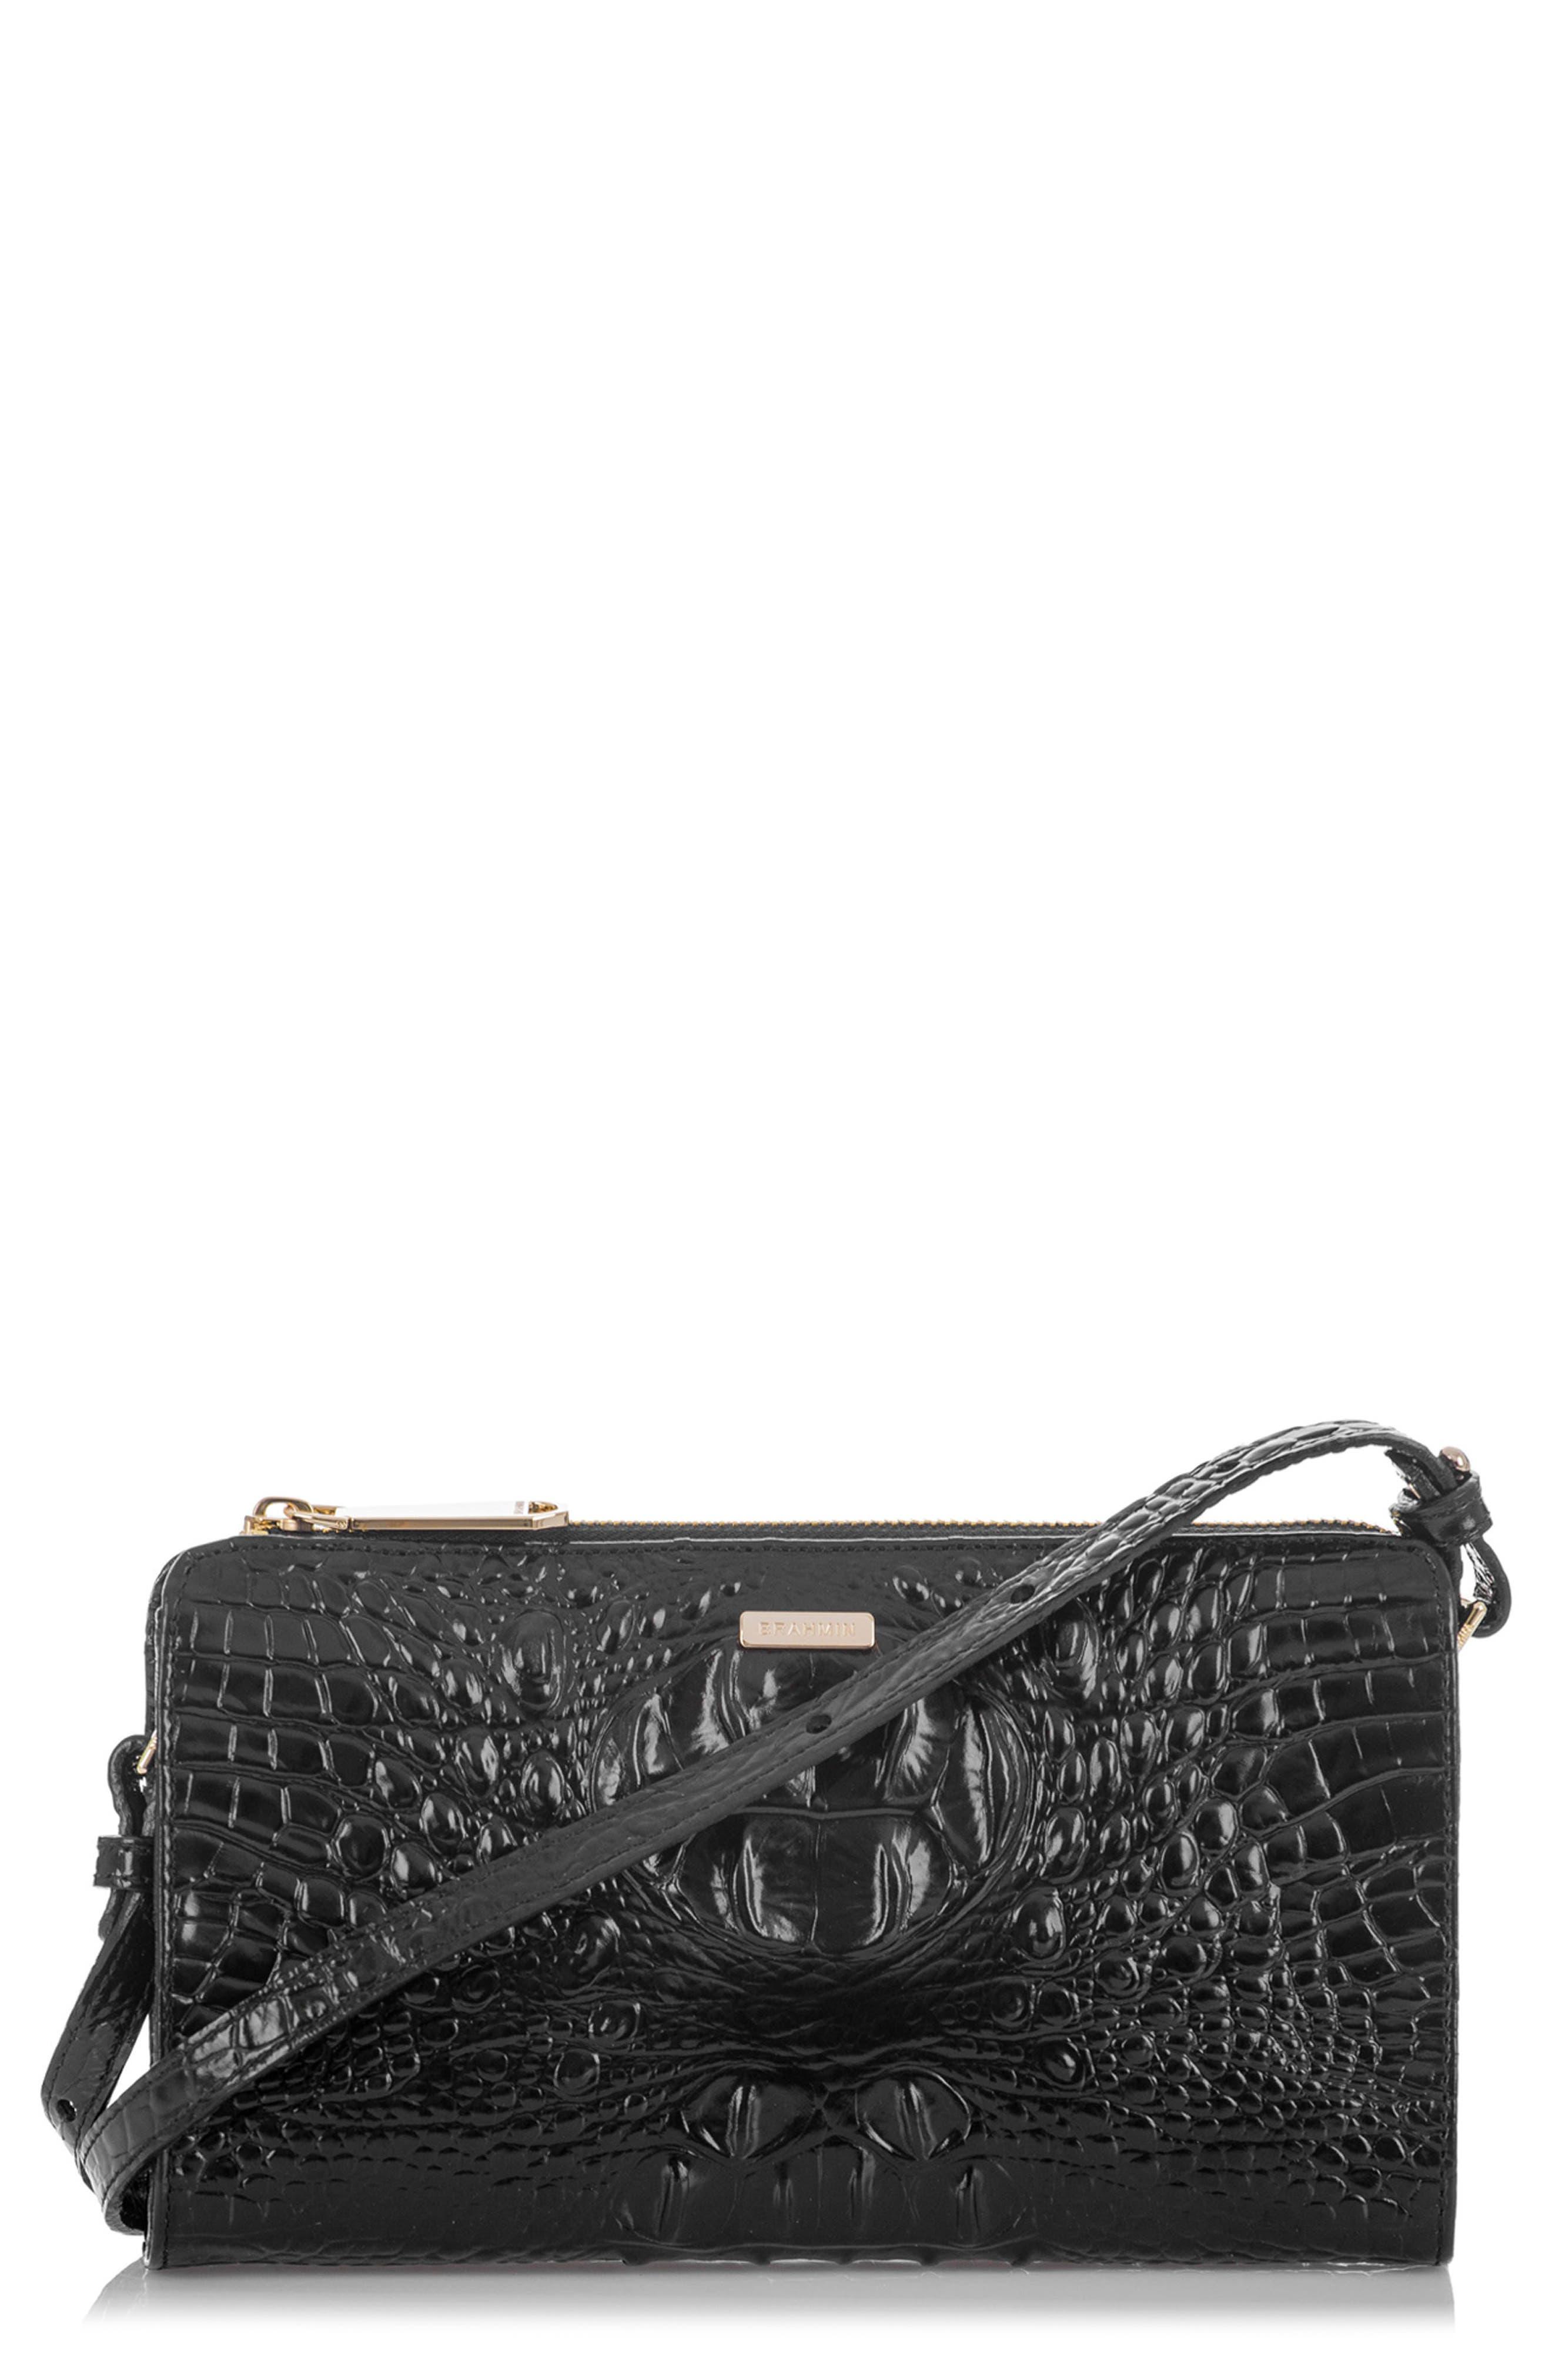 Alternate Image 1 Selected - Brahmin Sienna Leather Crossbody Bag